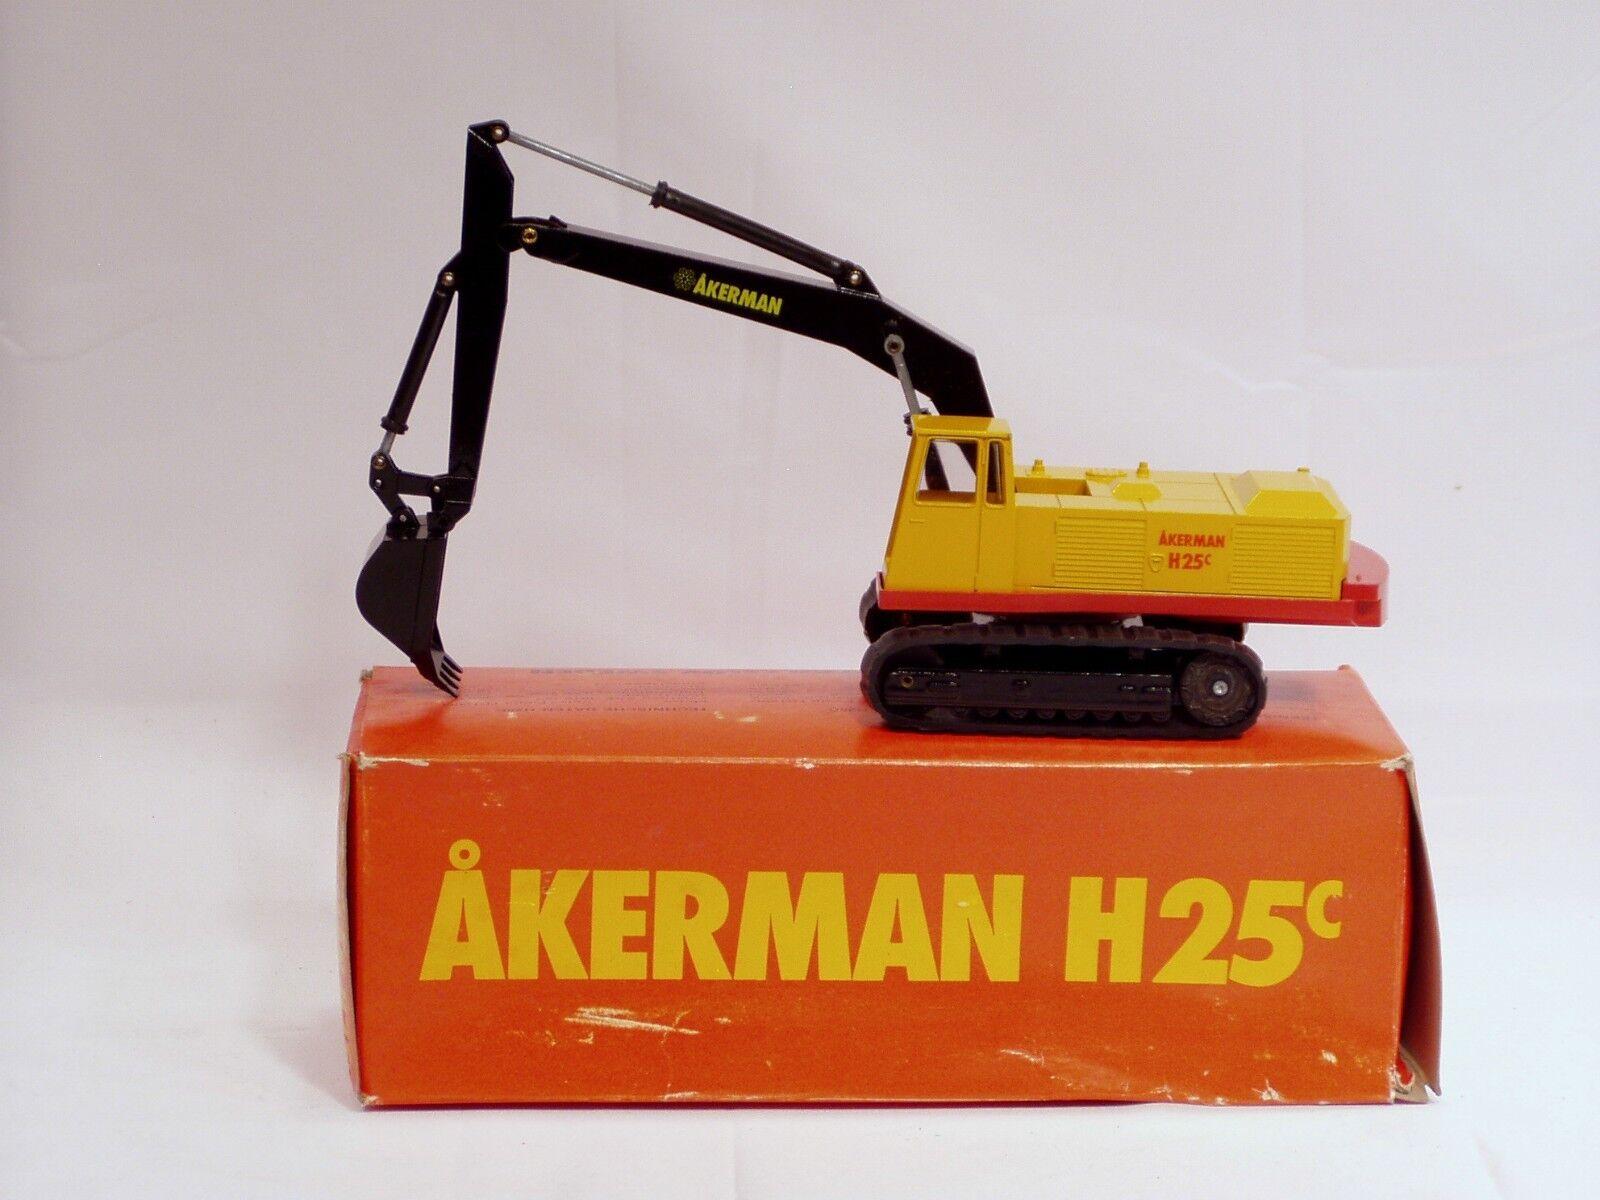 Akerman H25c Excavator - 1/50 - NZG #148 - MIB